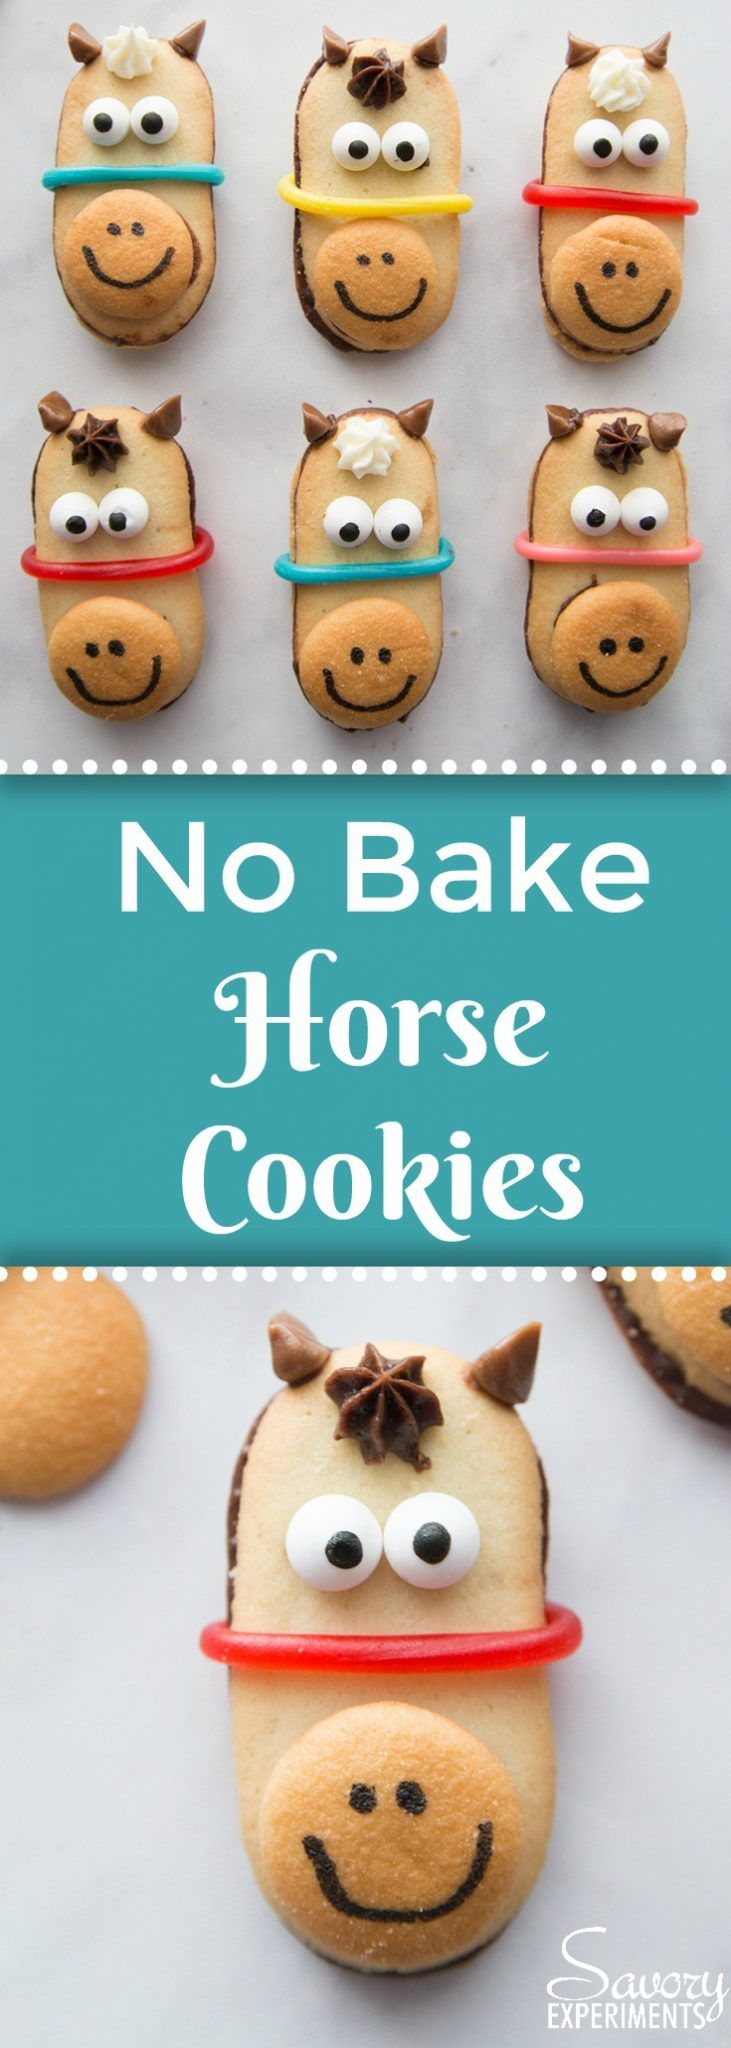 No Bake Horse Cookies